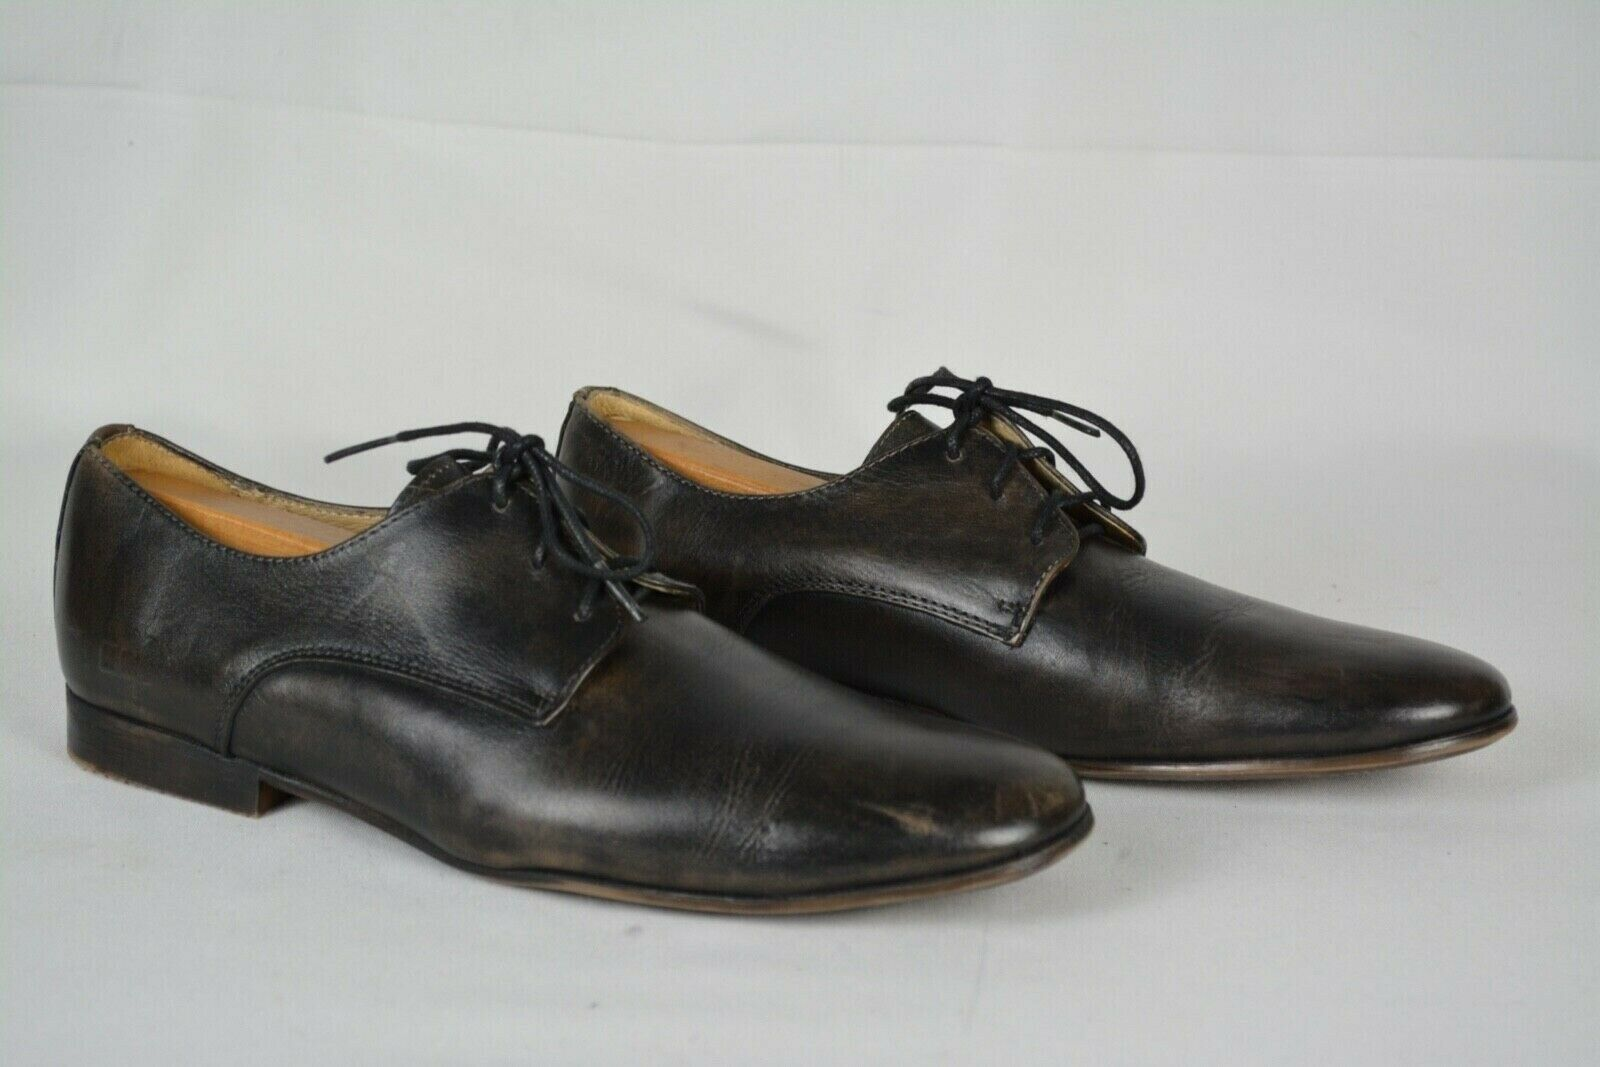 Bed Stu Hommes Newman derby cuir noir Pointure 10 Lacets Casual Oxford